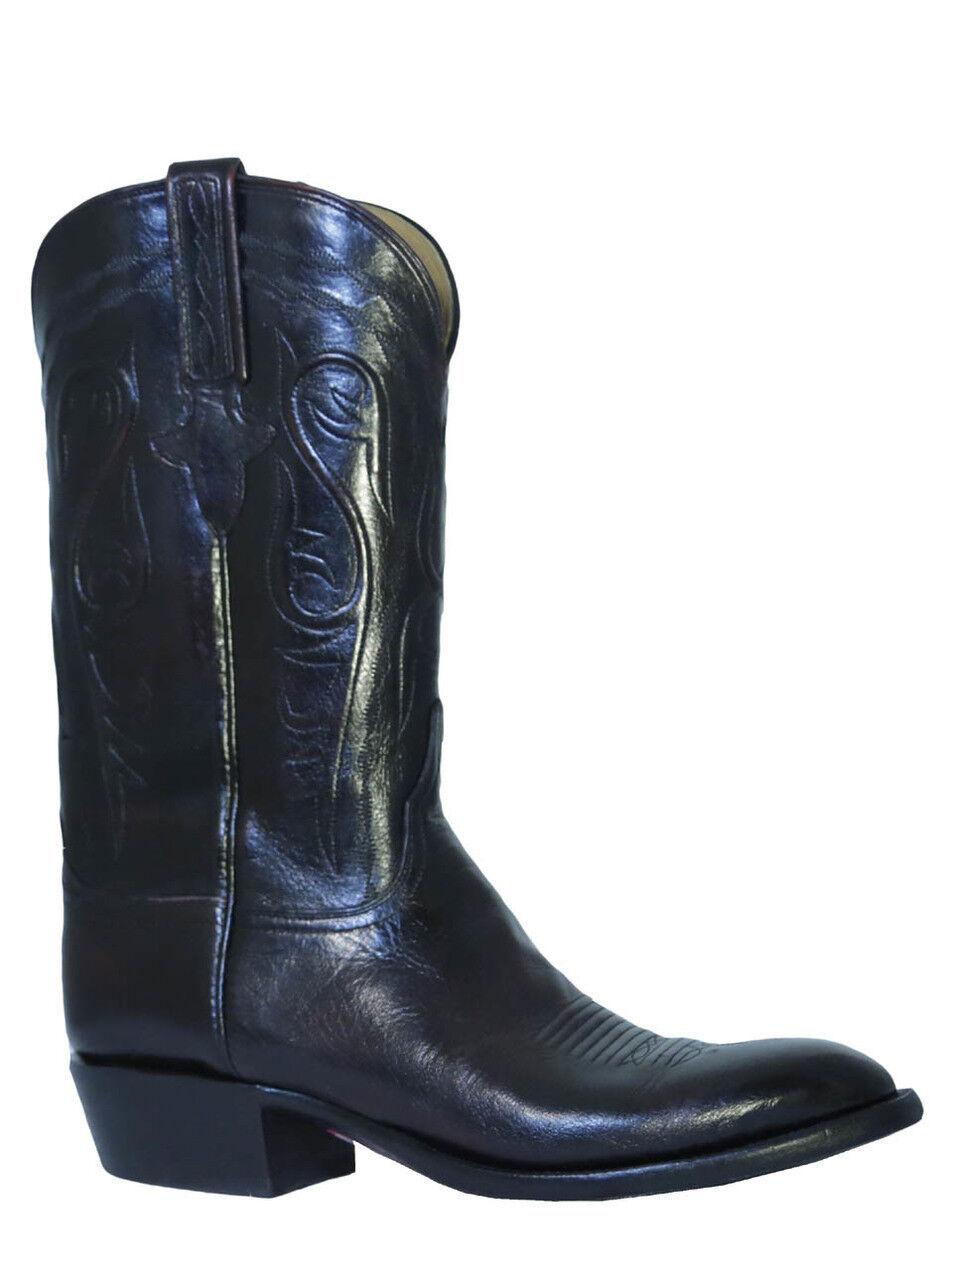 Men's Lucchese Classics botas De Búfalo cereza negra L1580.X13